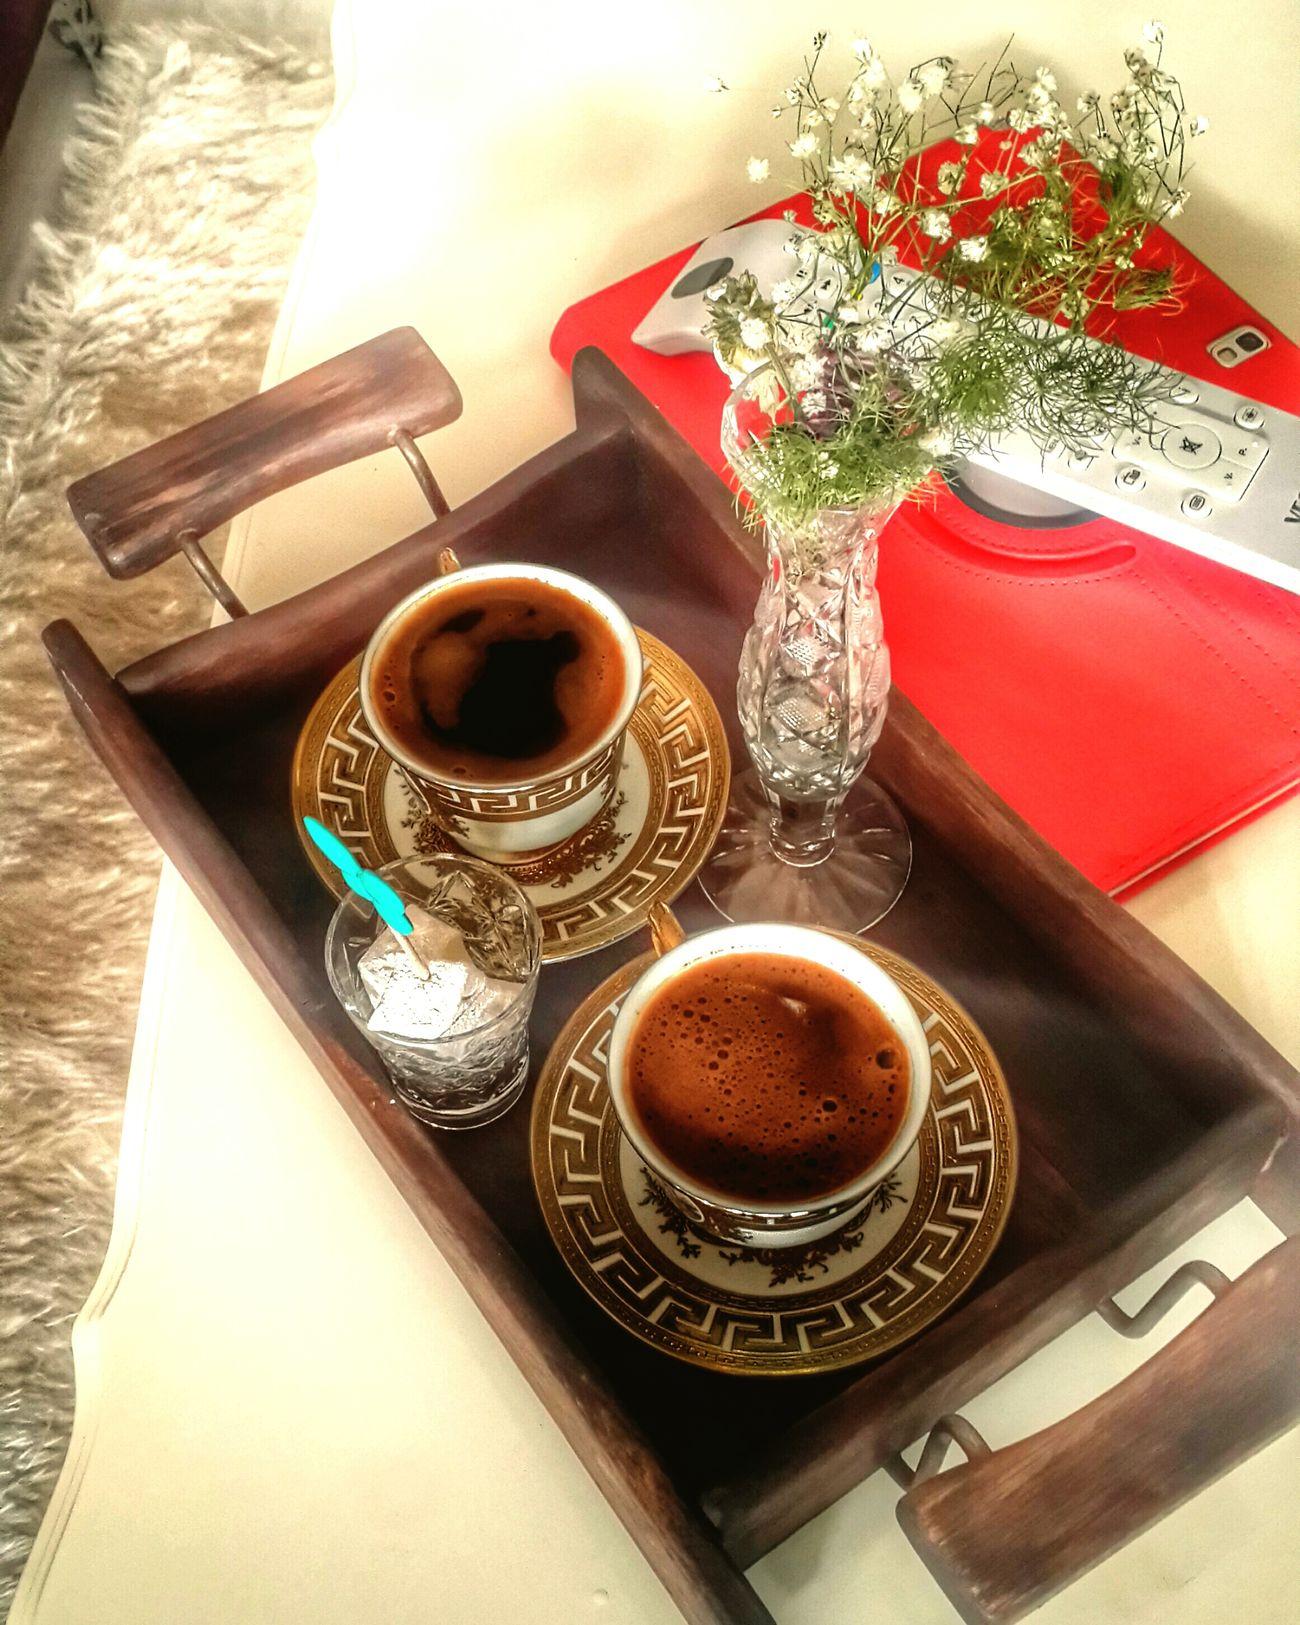 Coffee Hanging Out Happiness EyeEmBestPics EyeEm Best Edits EyeEm Best Shots Love Hello World Cafe Time Turkey